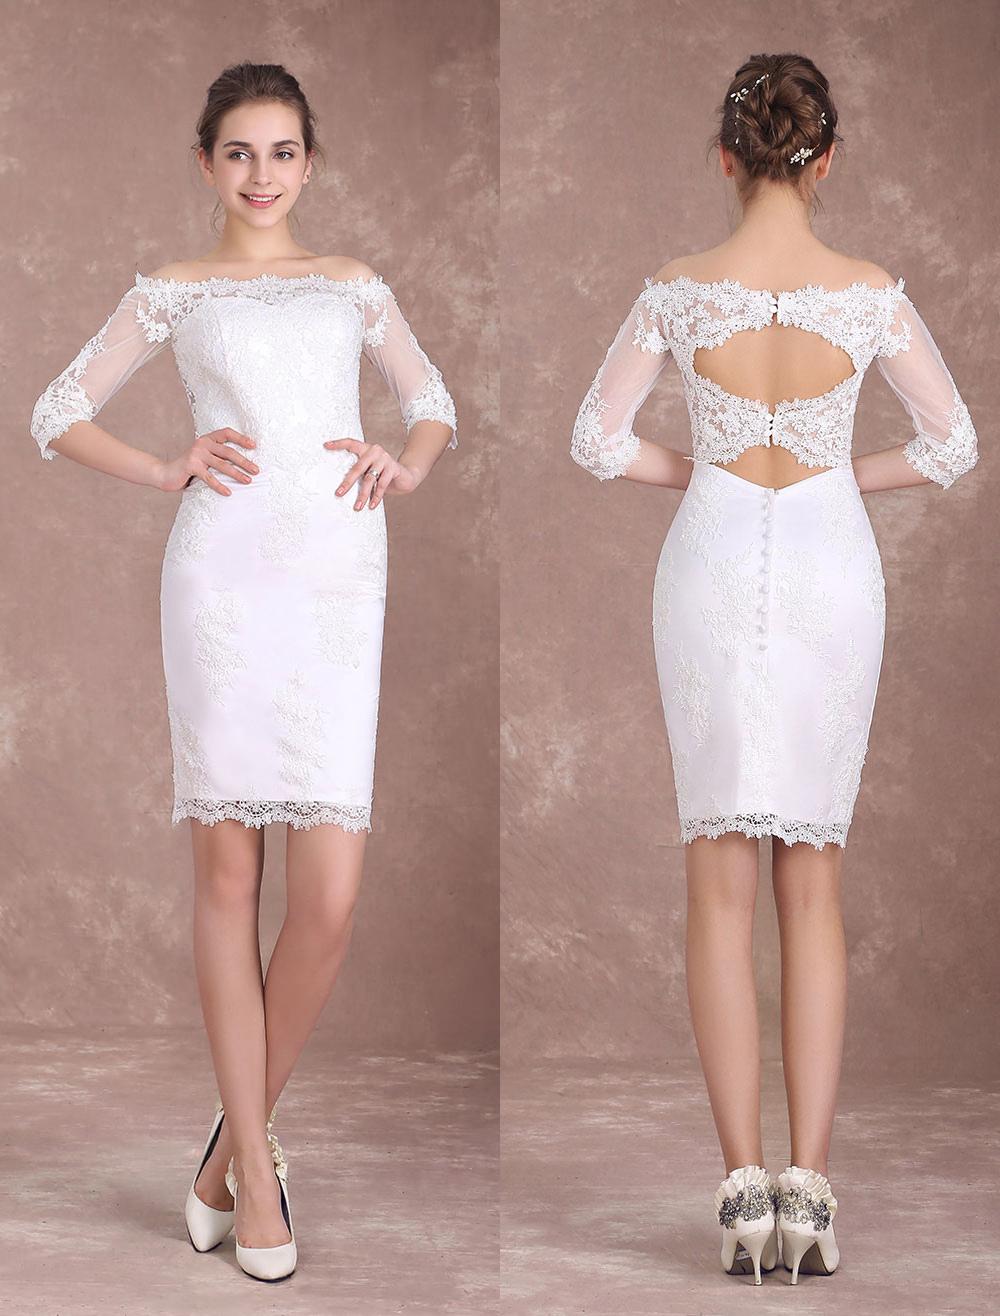 Short Wedding Dresses Sheath Lace Bridal Dress Ivory Off The Shoulder Half Sleeve Illusion Knee Length Column Wedding Reception Dress Milanoo